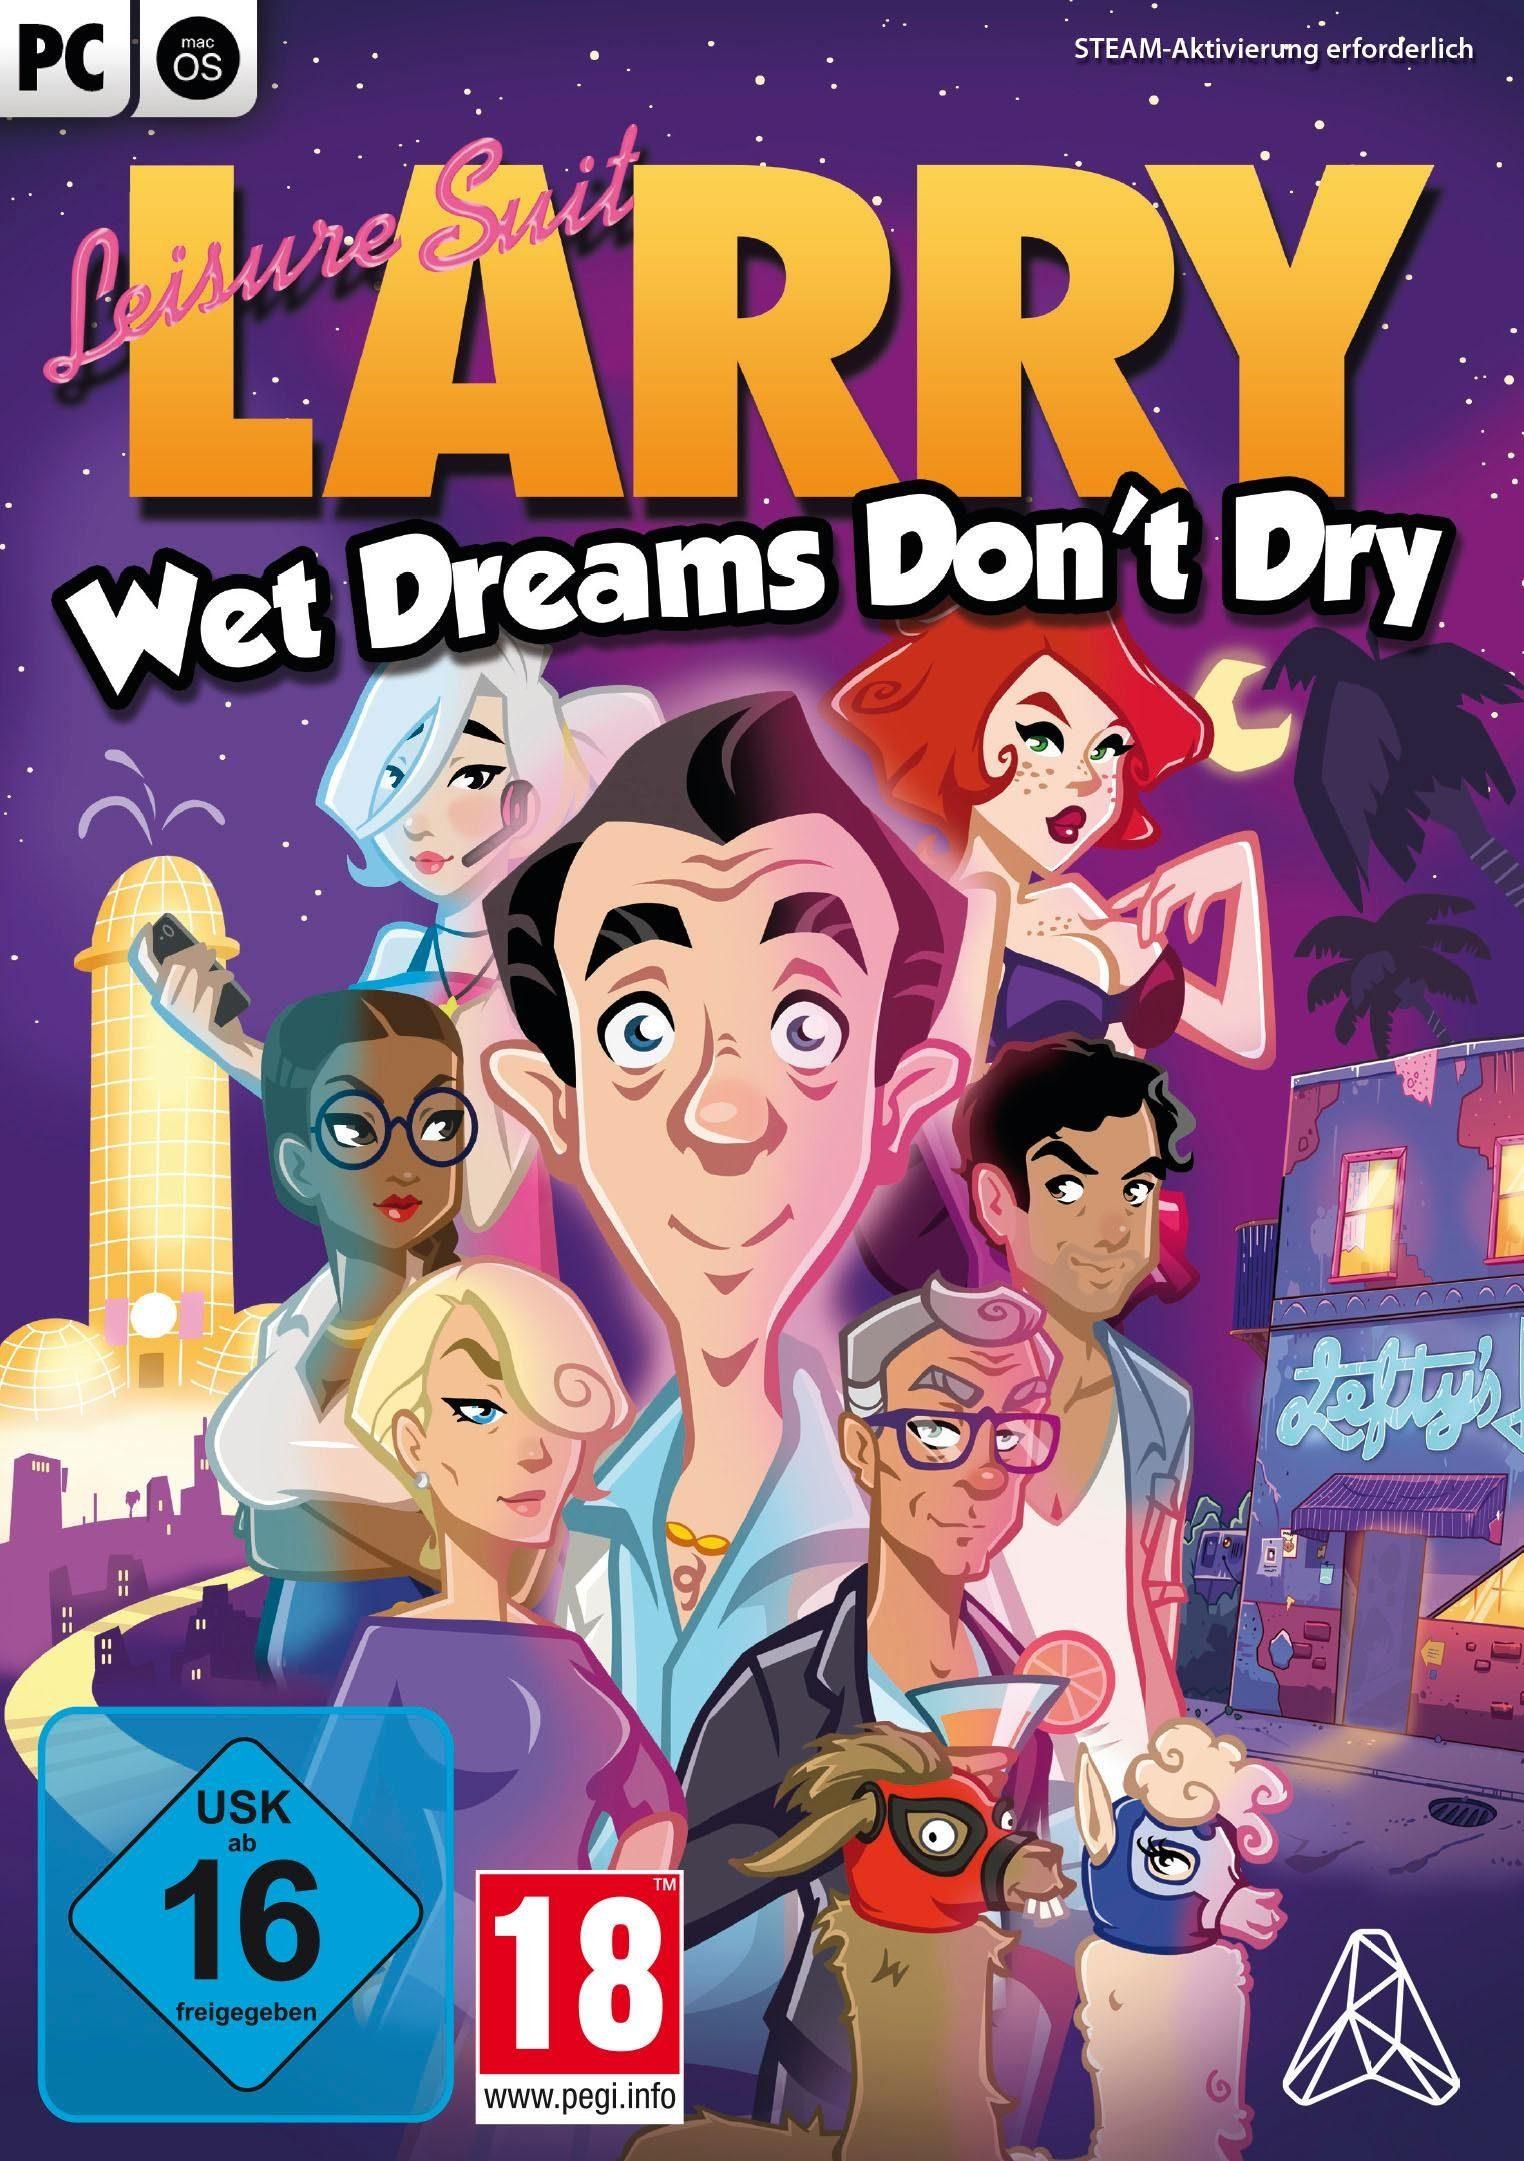 Leisure Suit Larry: Wet Dreams Don't Dry PC, Software Pyramide